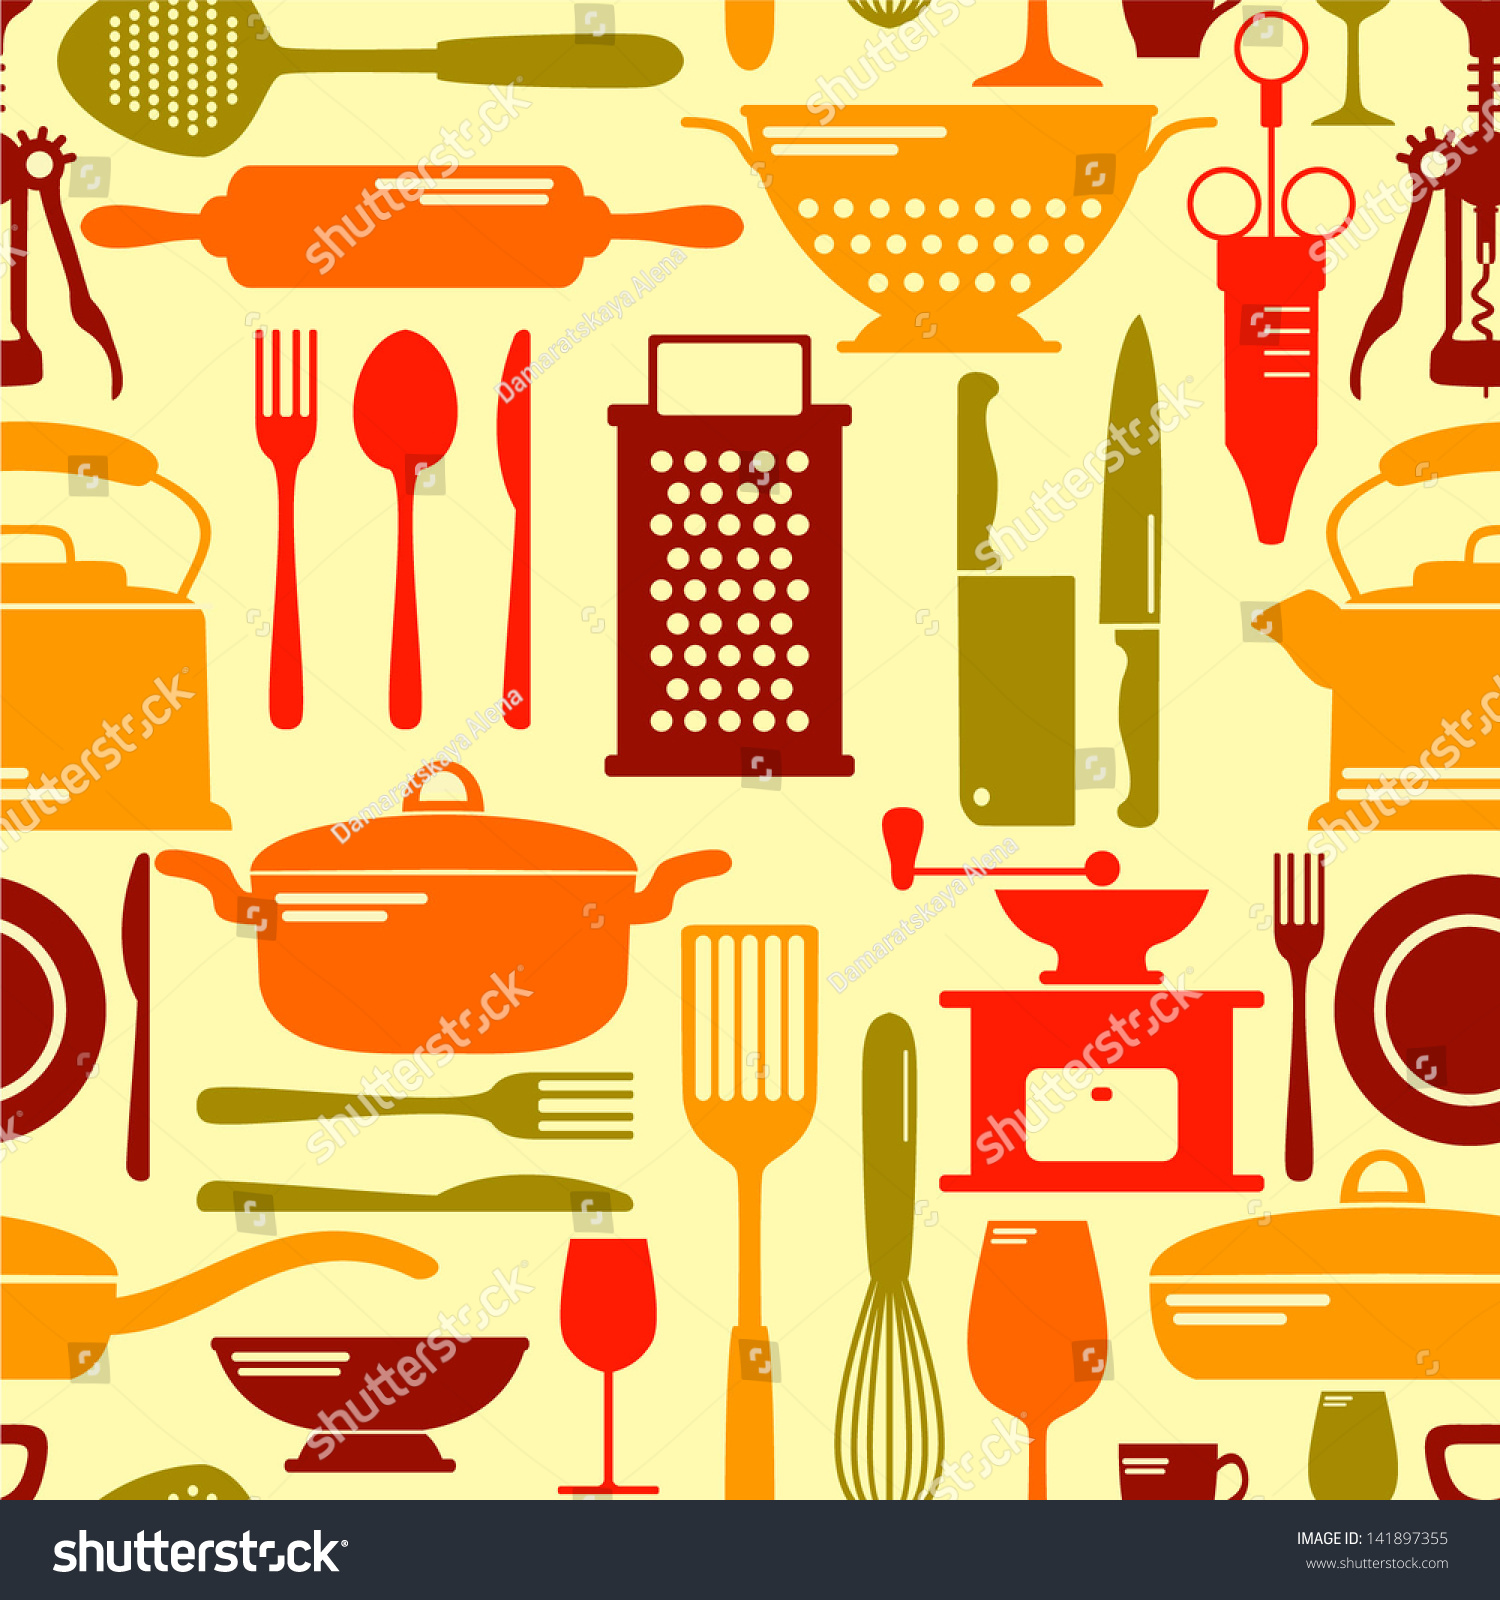 Kitchen Background Image: Seamless Kitchen Background Stock Vector 141897355